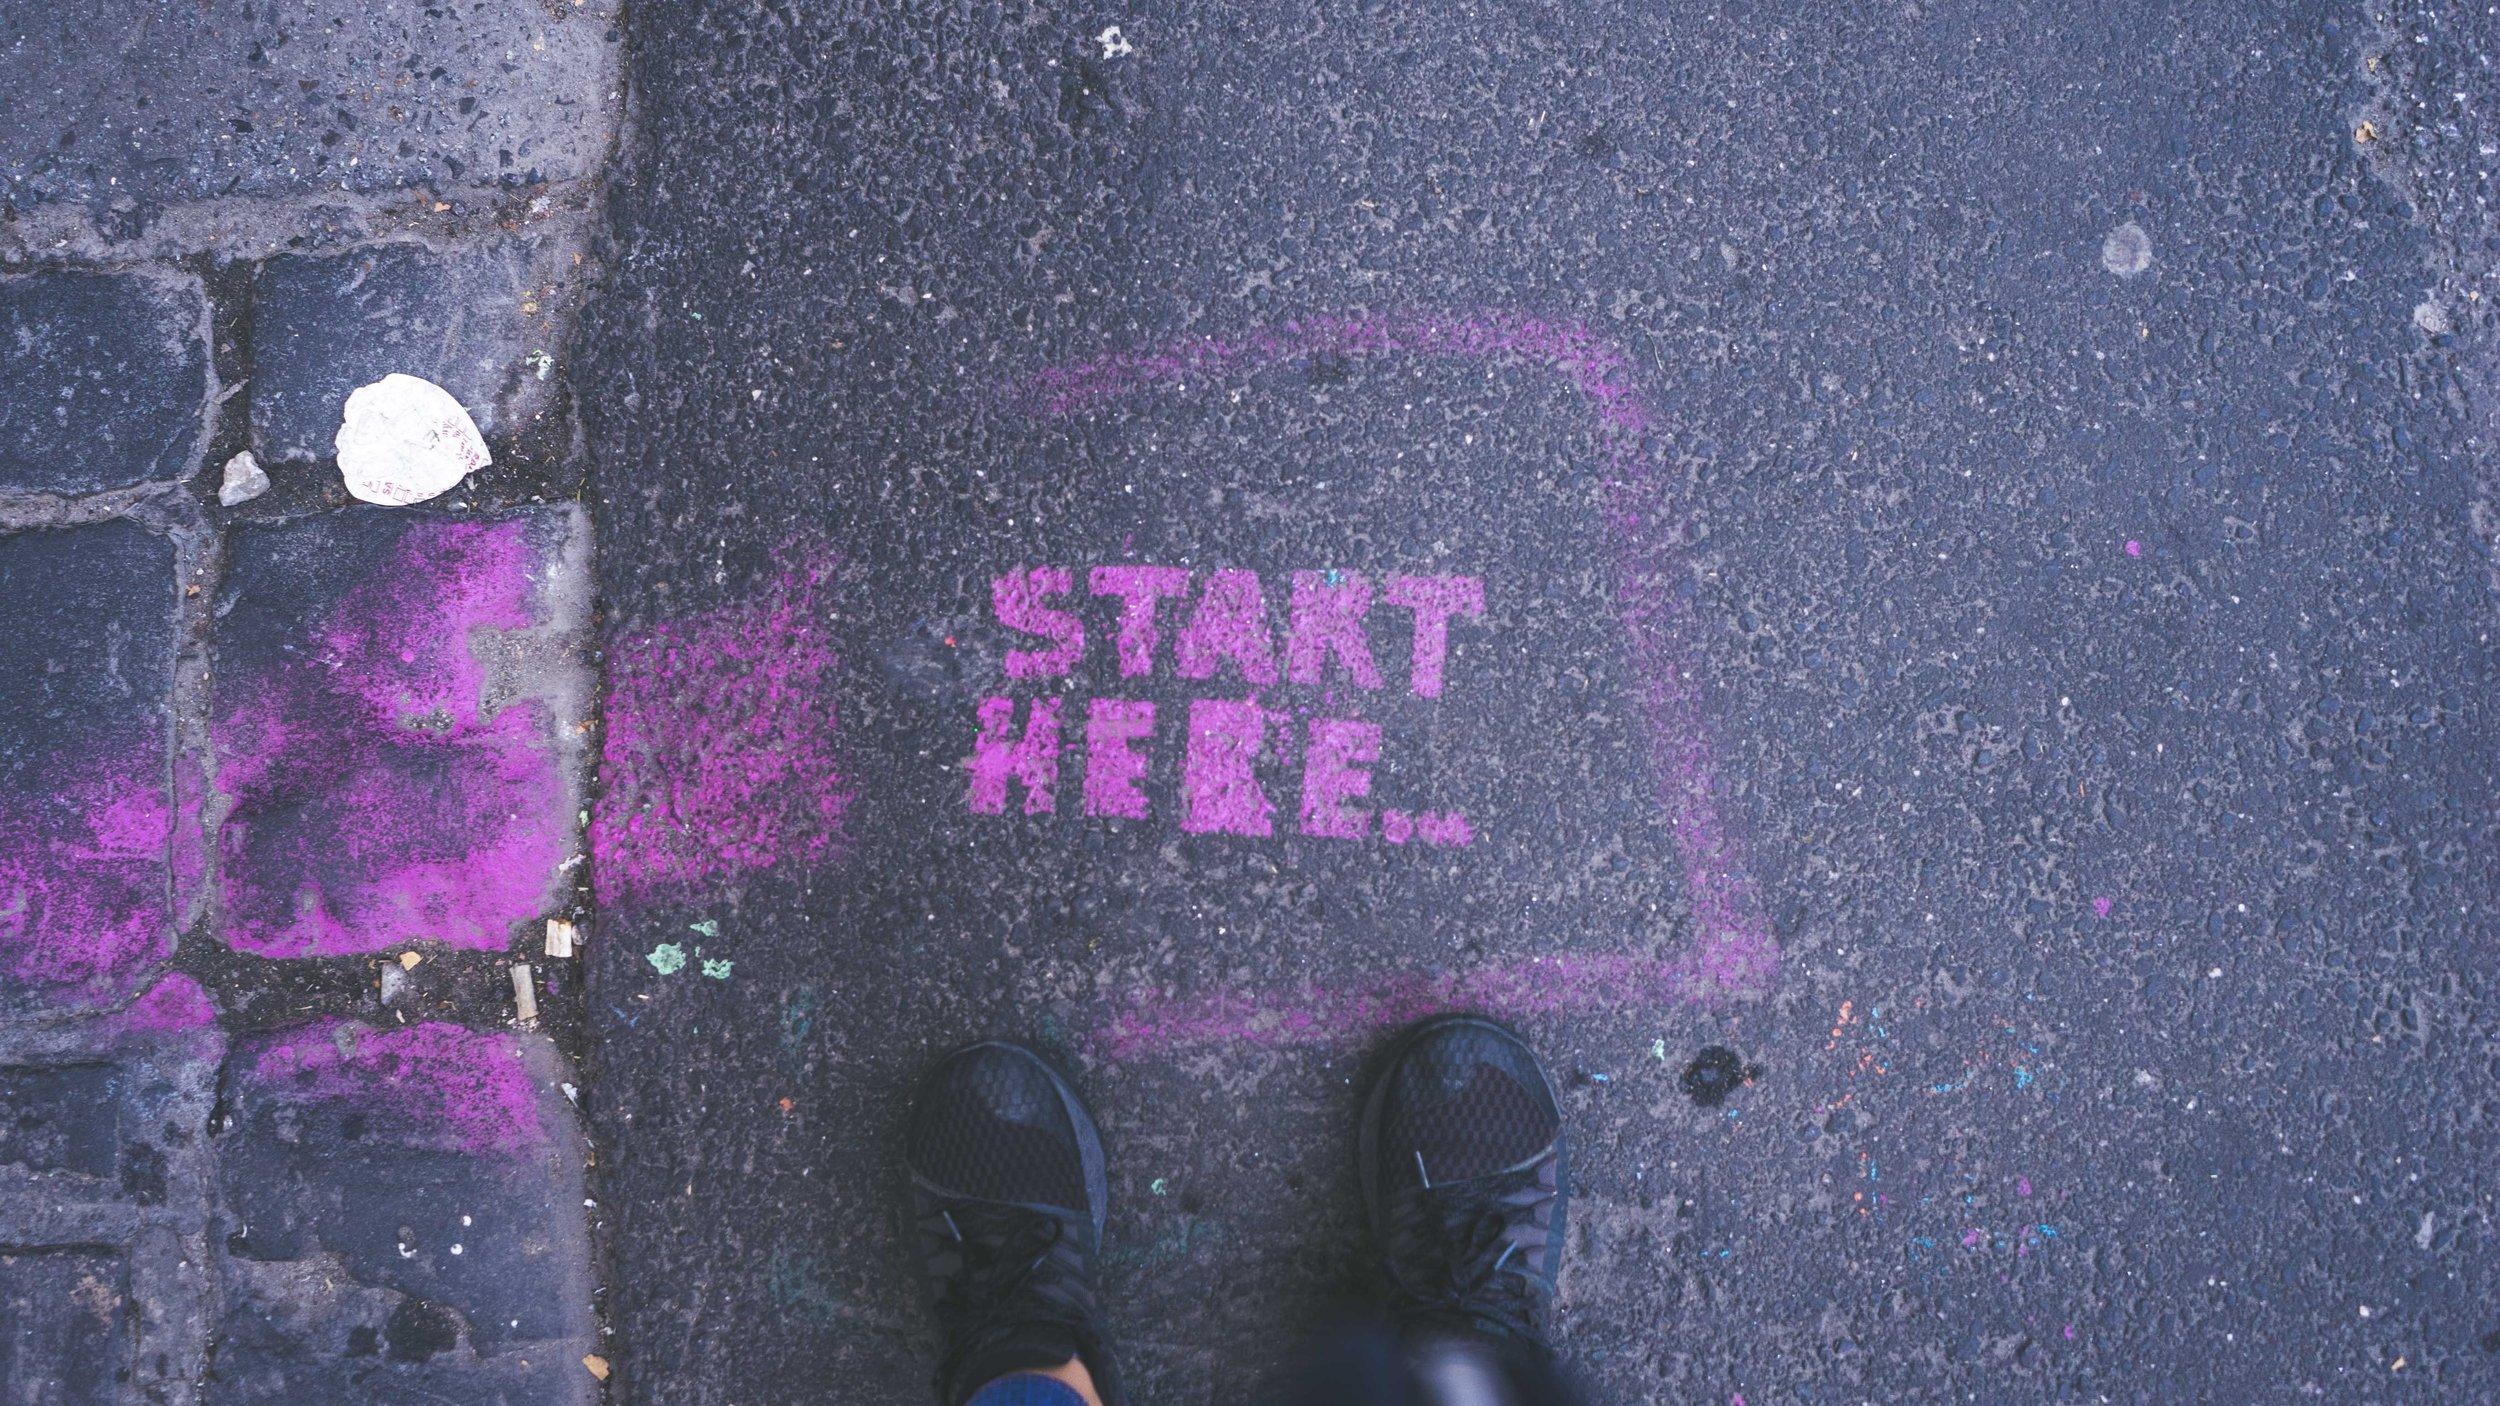 start here gia-oris-_uM5_nG2ssc-unsplash.jpg